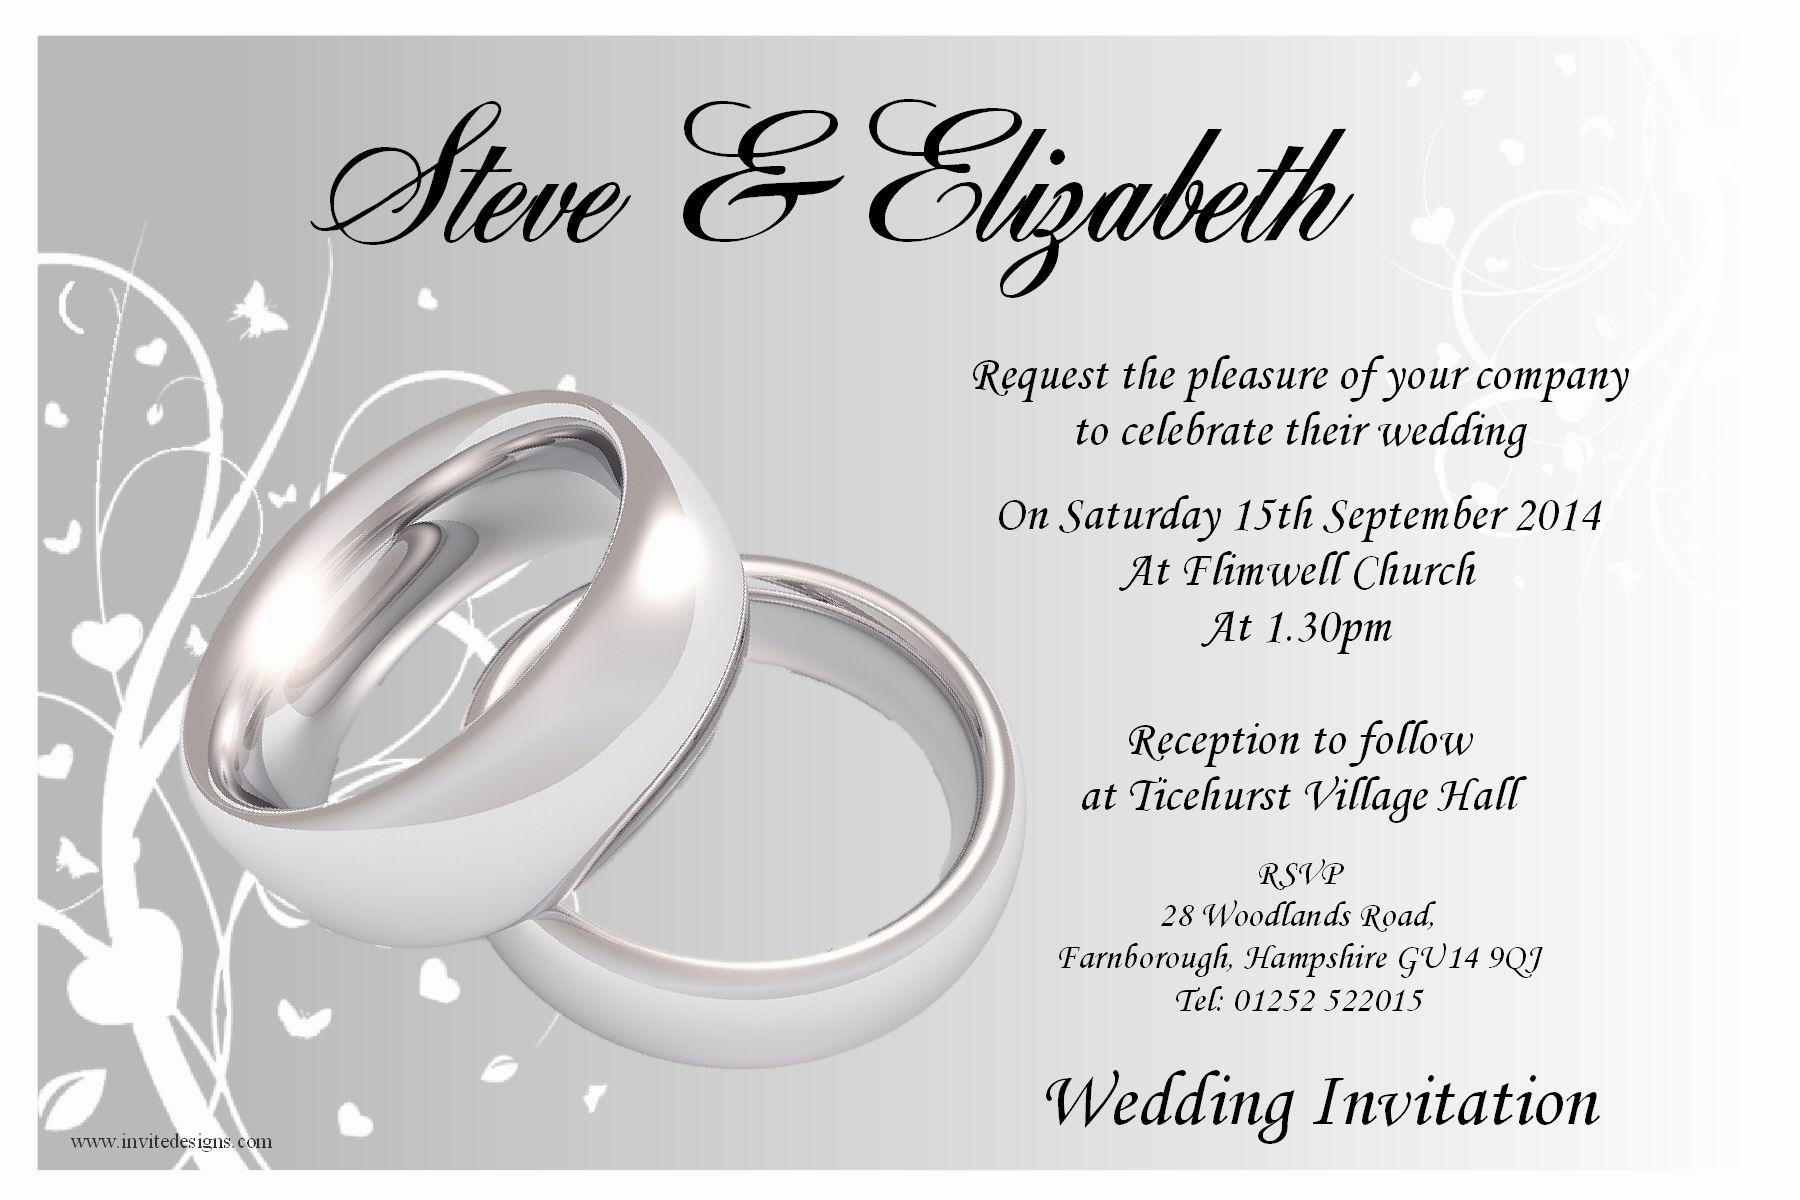 Free Printable Blank Invitation Templates | Vastuuonminun Engagement - Free Printable Engagement Invitations